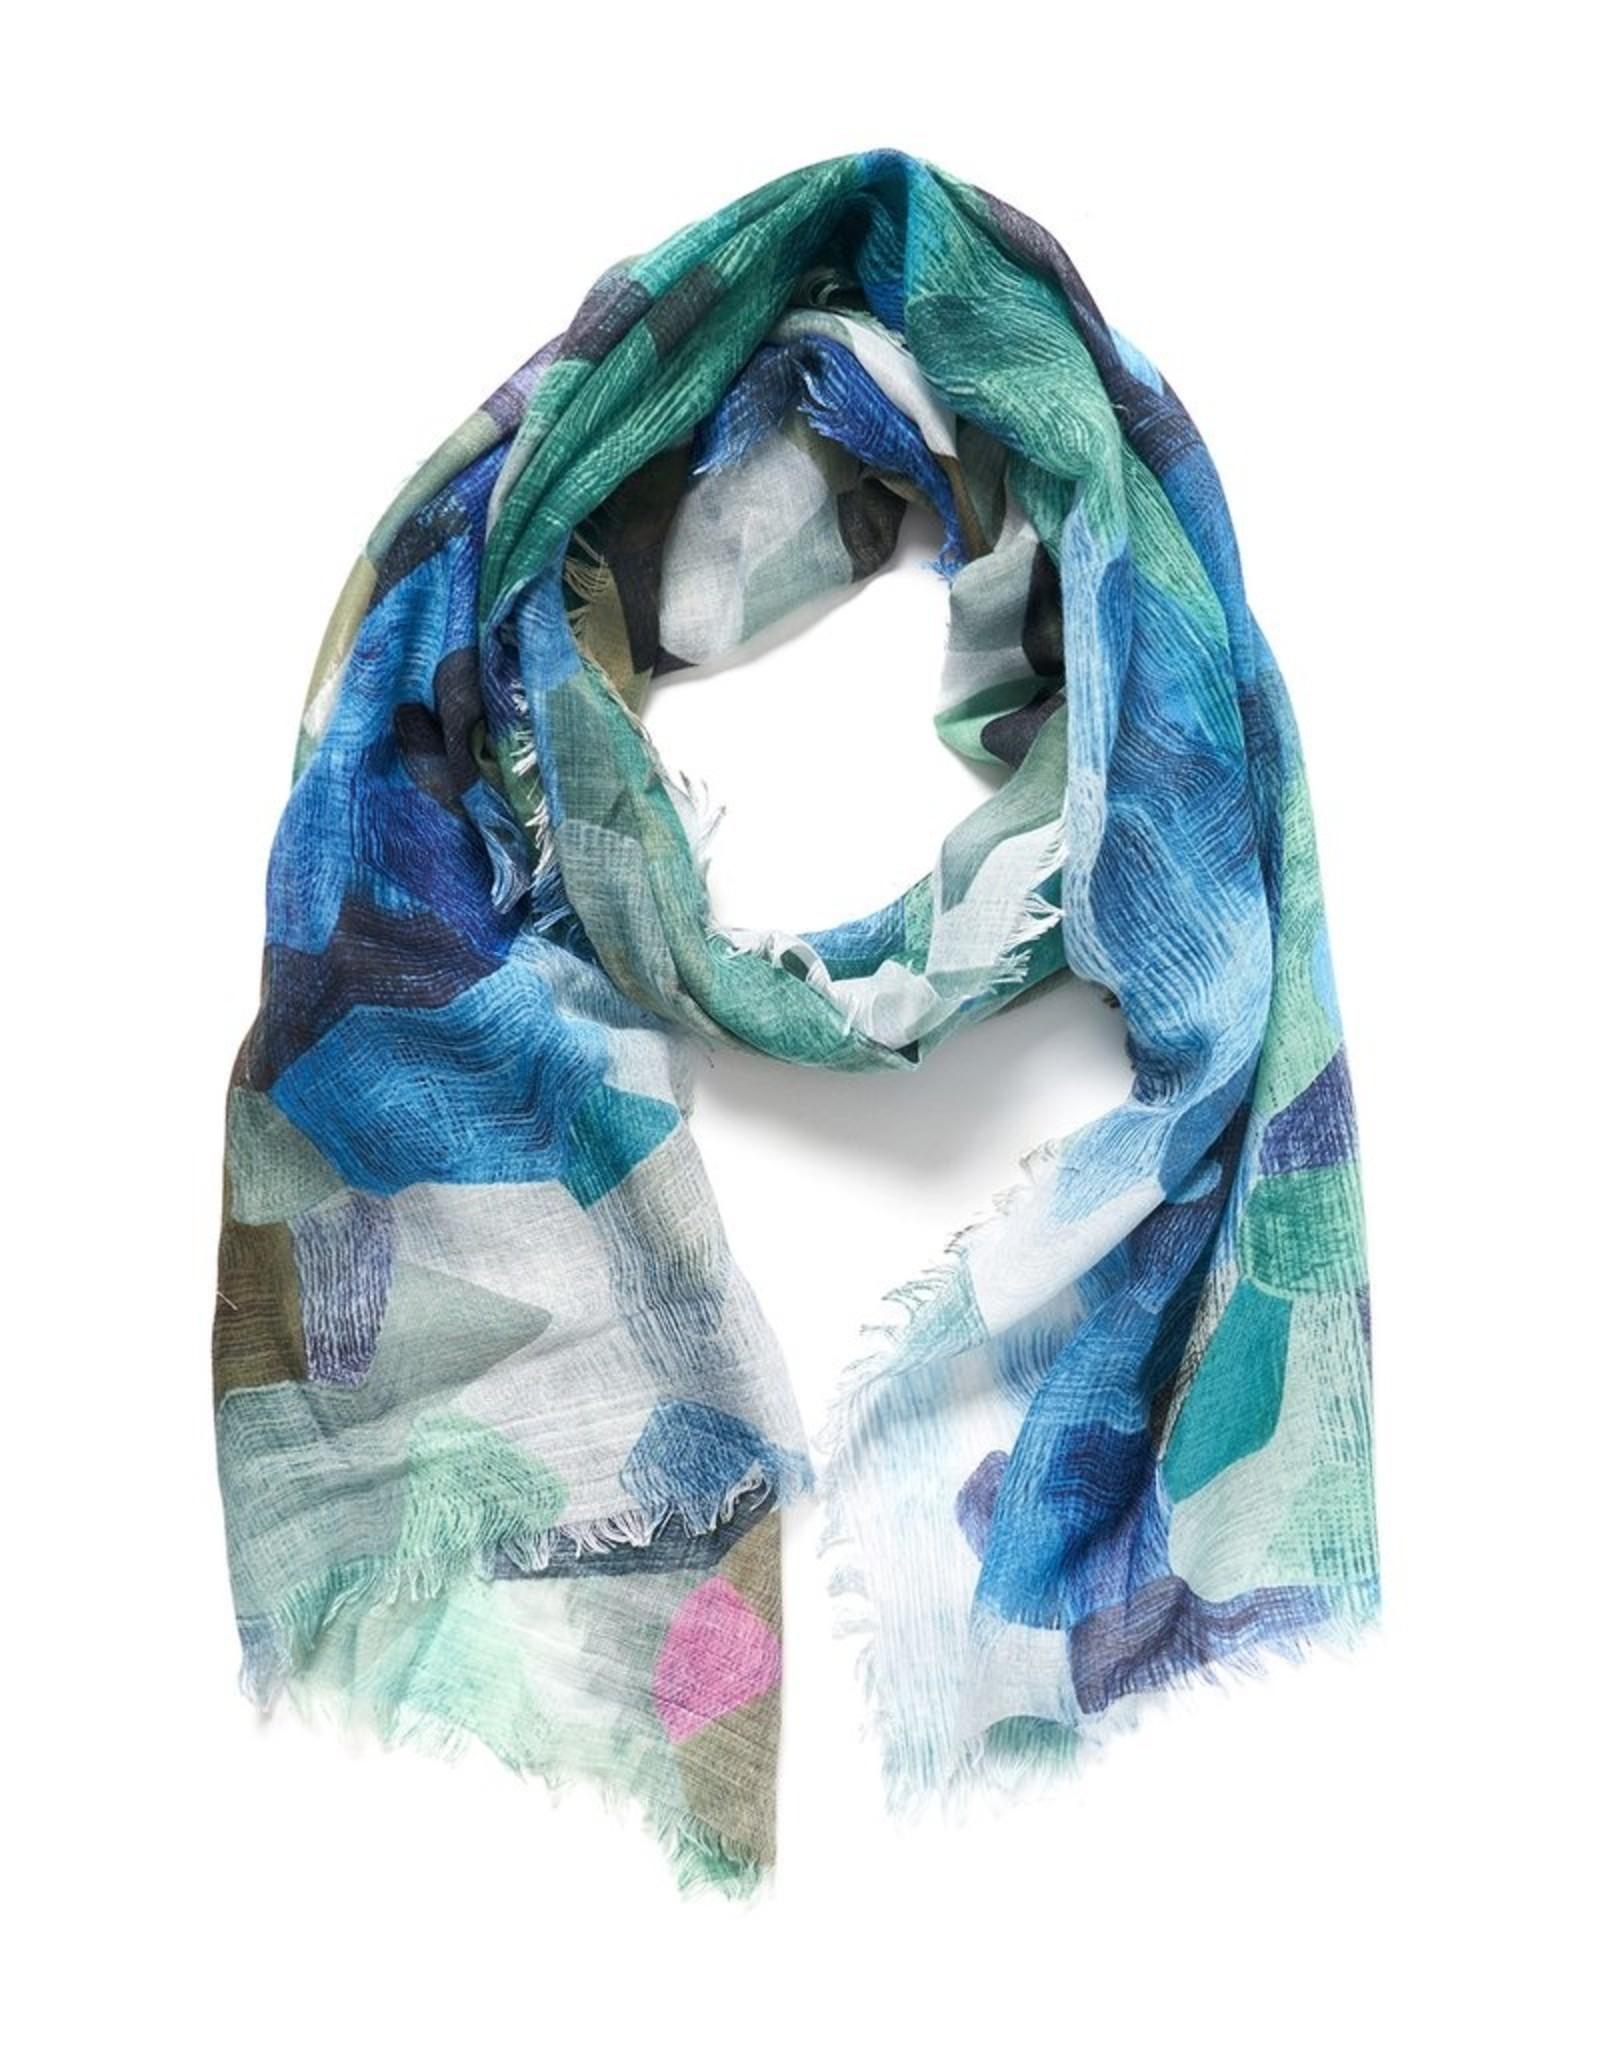 Pixelate light scarf (green)